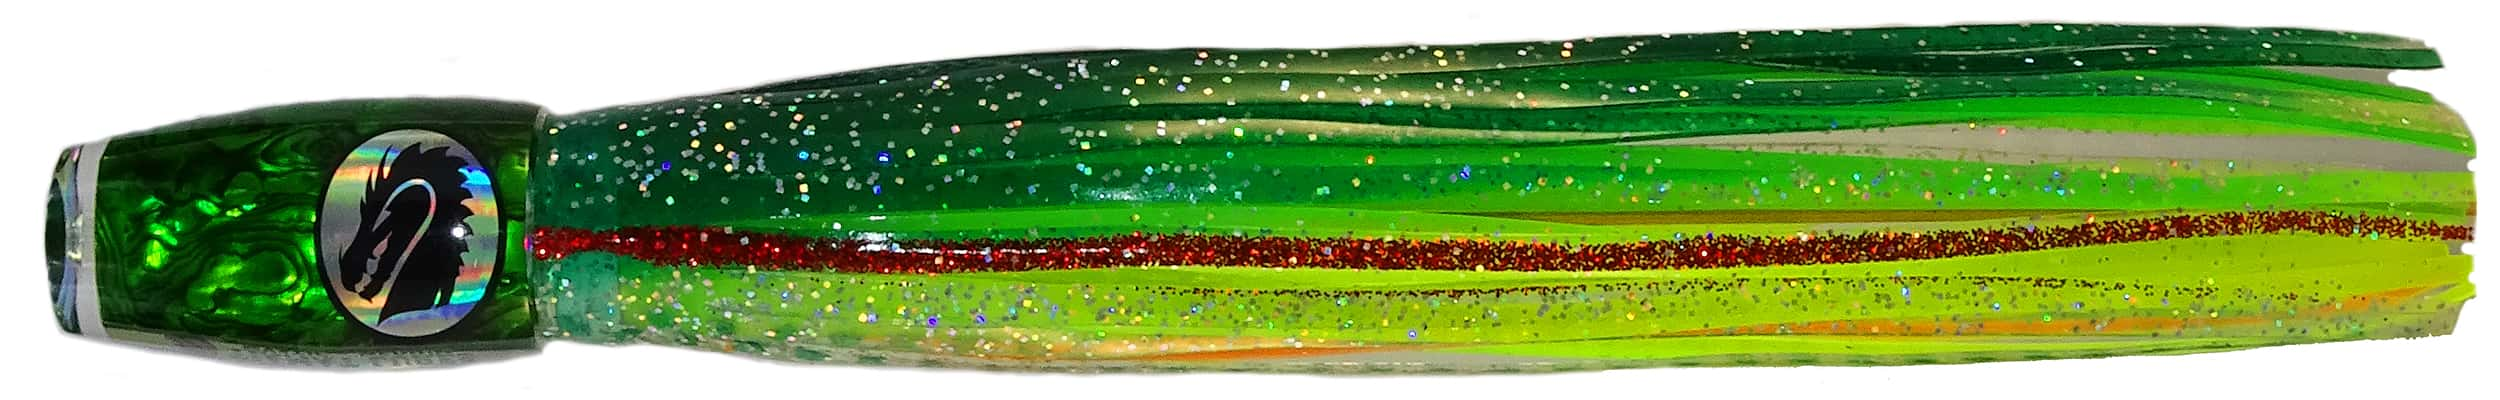 Tiamat Lures - Skirt Colour Scheme 02 - Ancient Mariner - OTLS07 - ITLS30